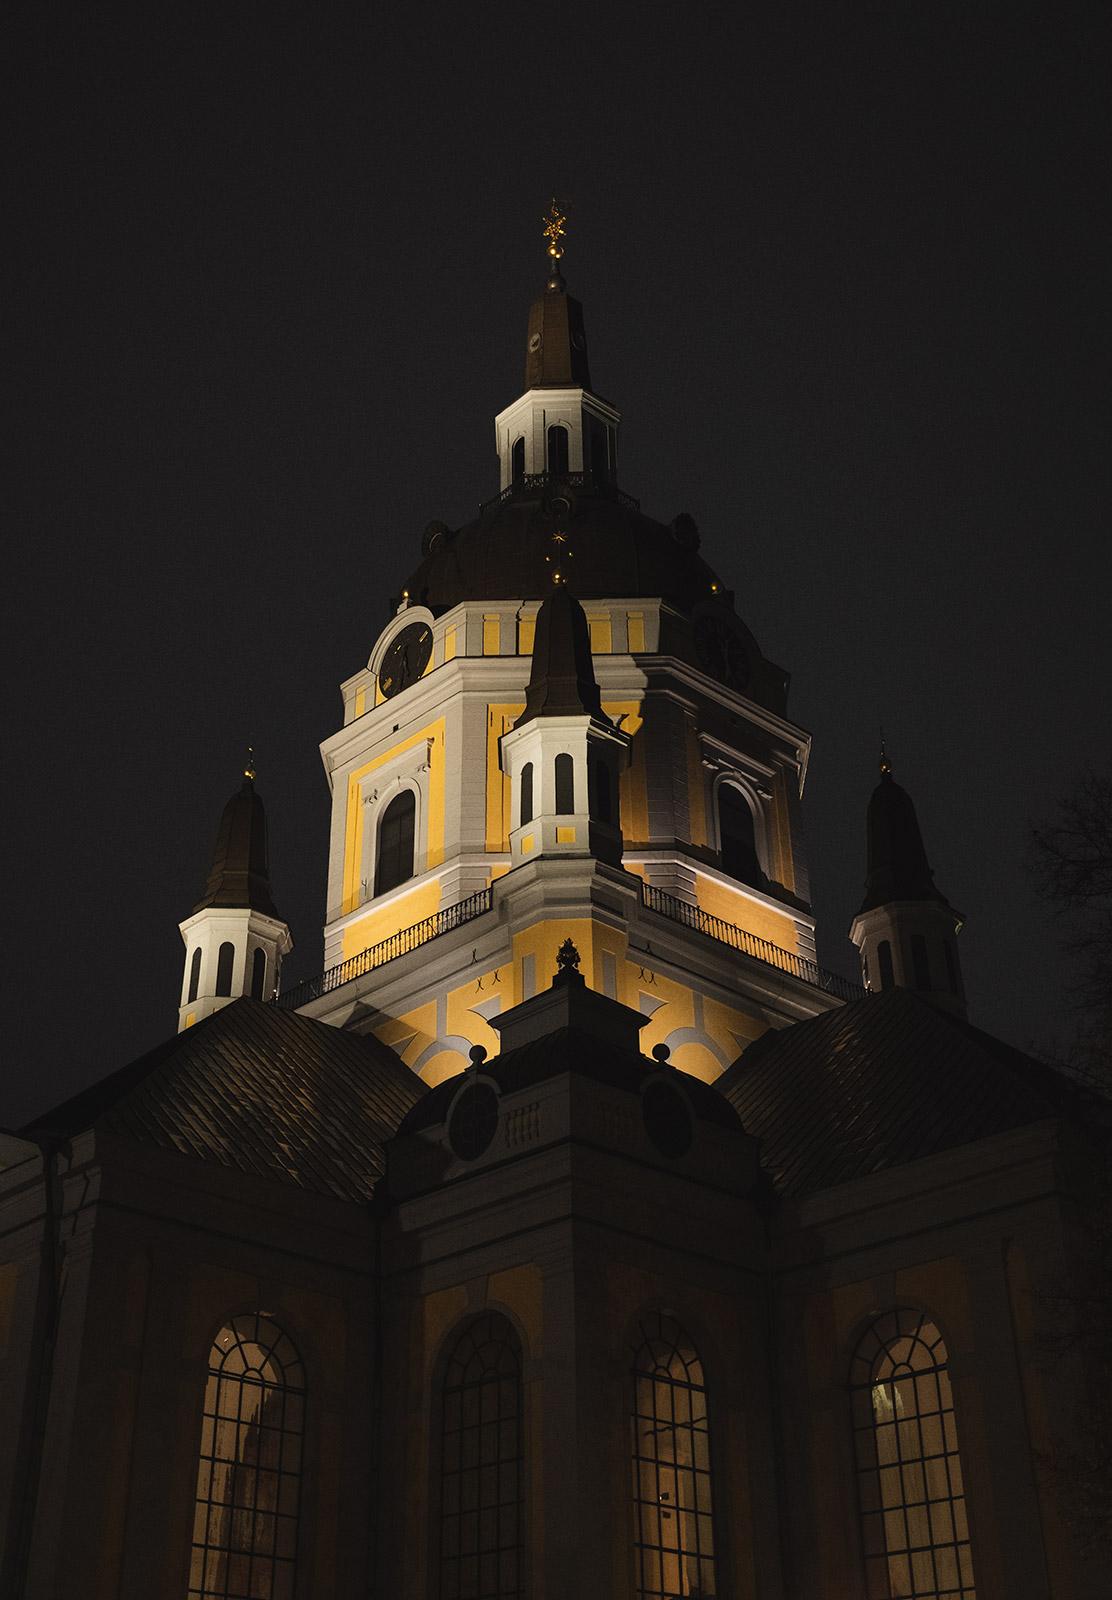 Yellow and grey church